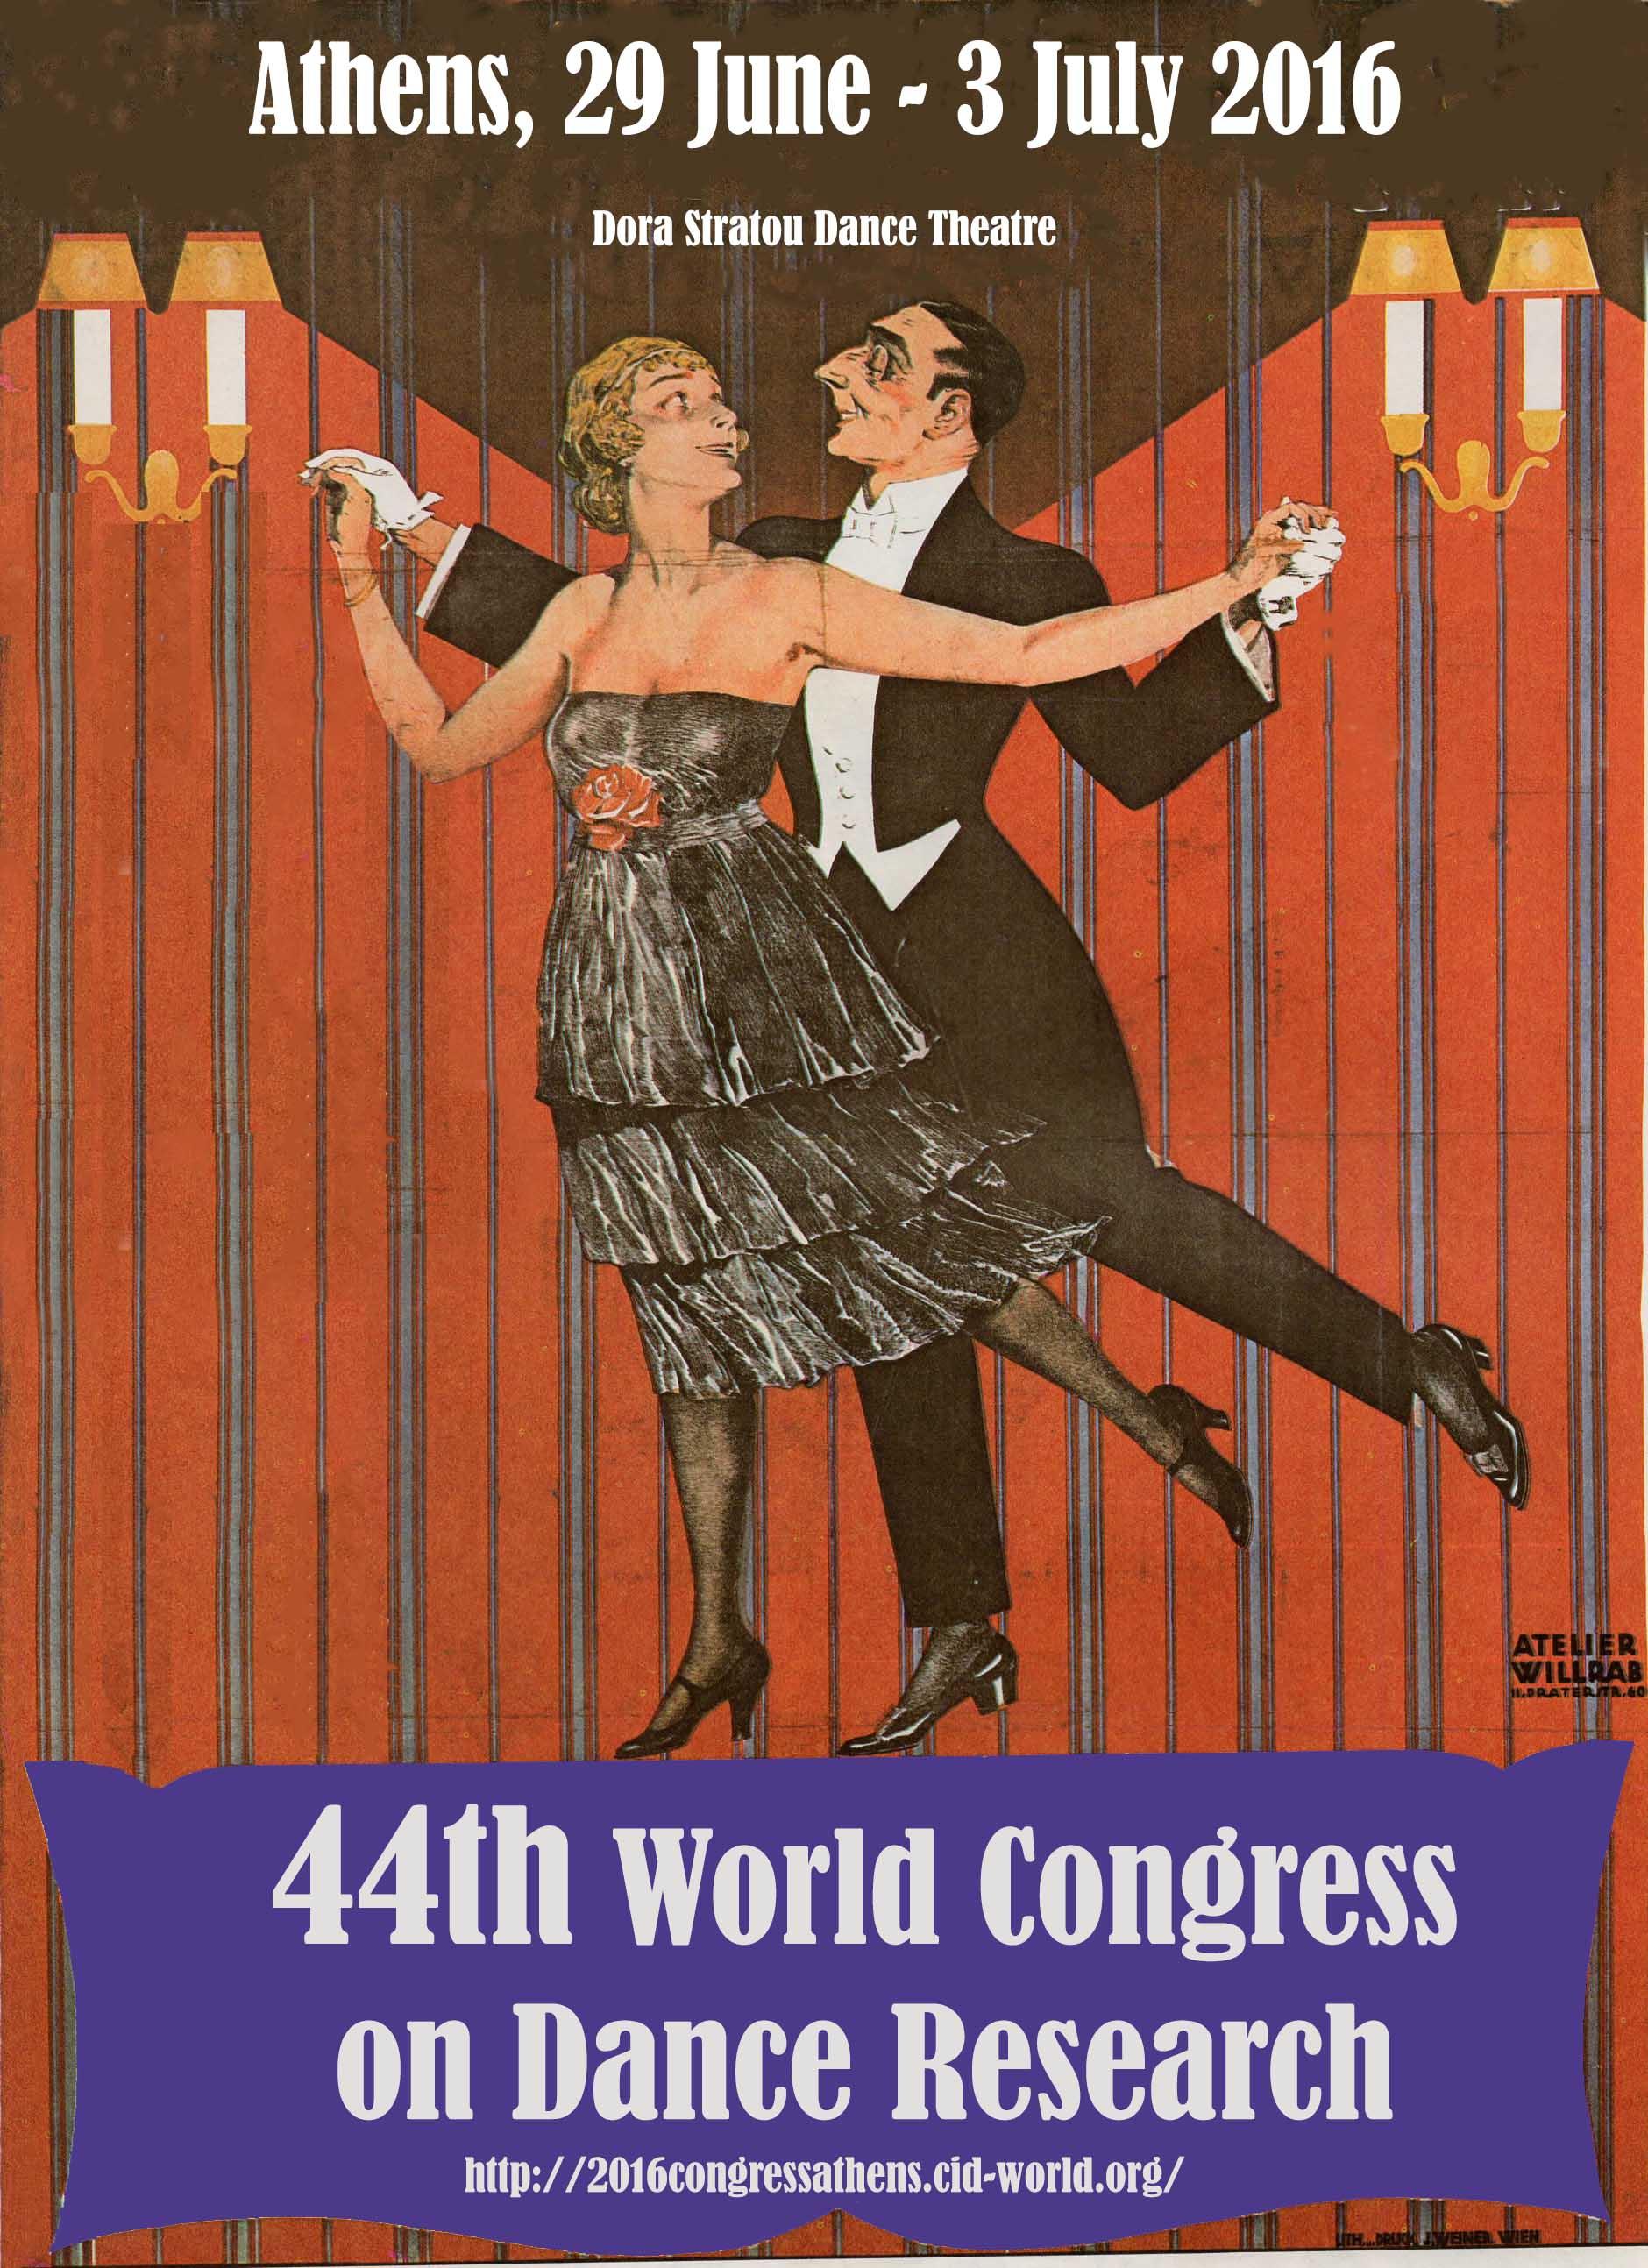 CID 44th International World Congress on Dance Research